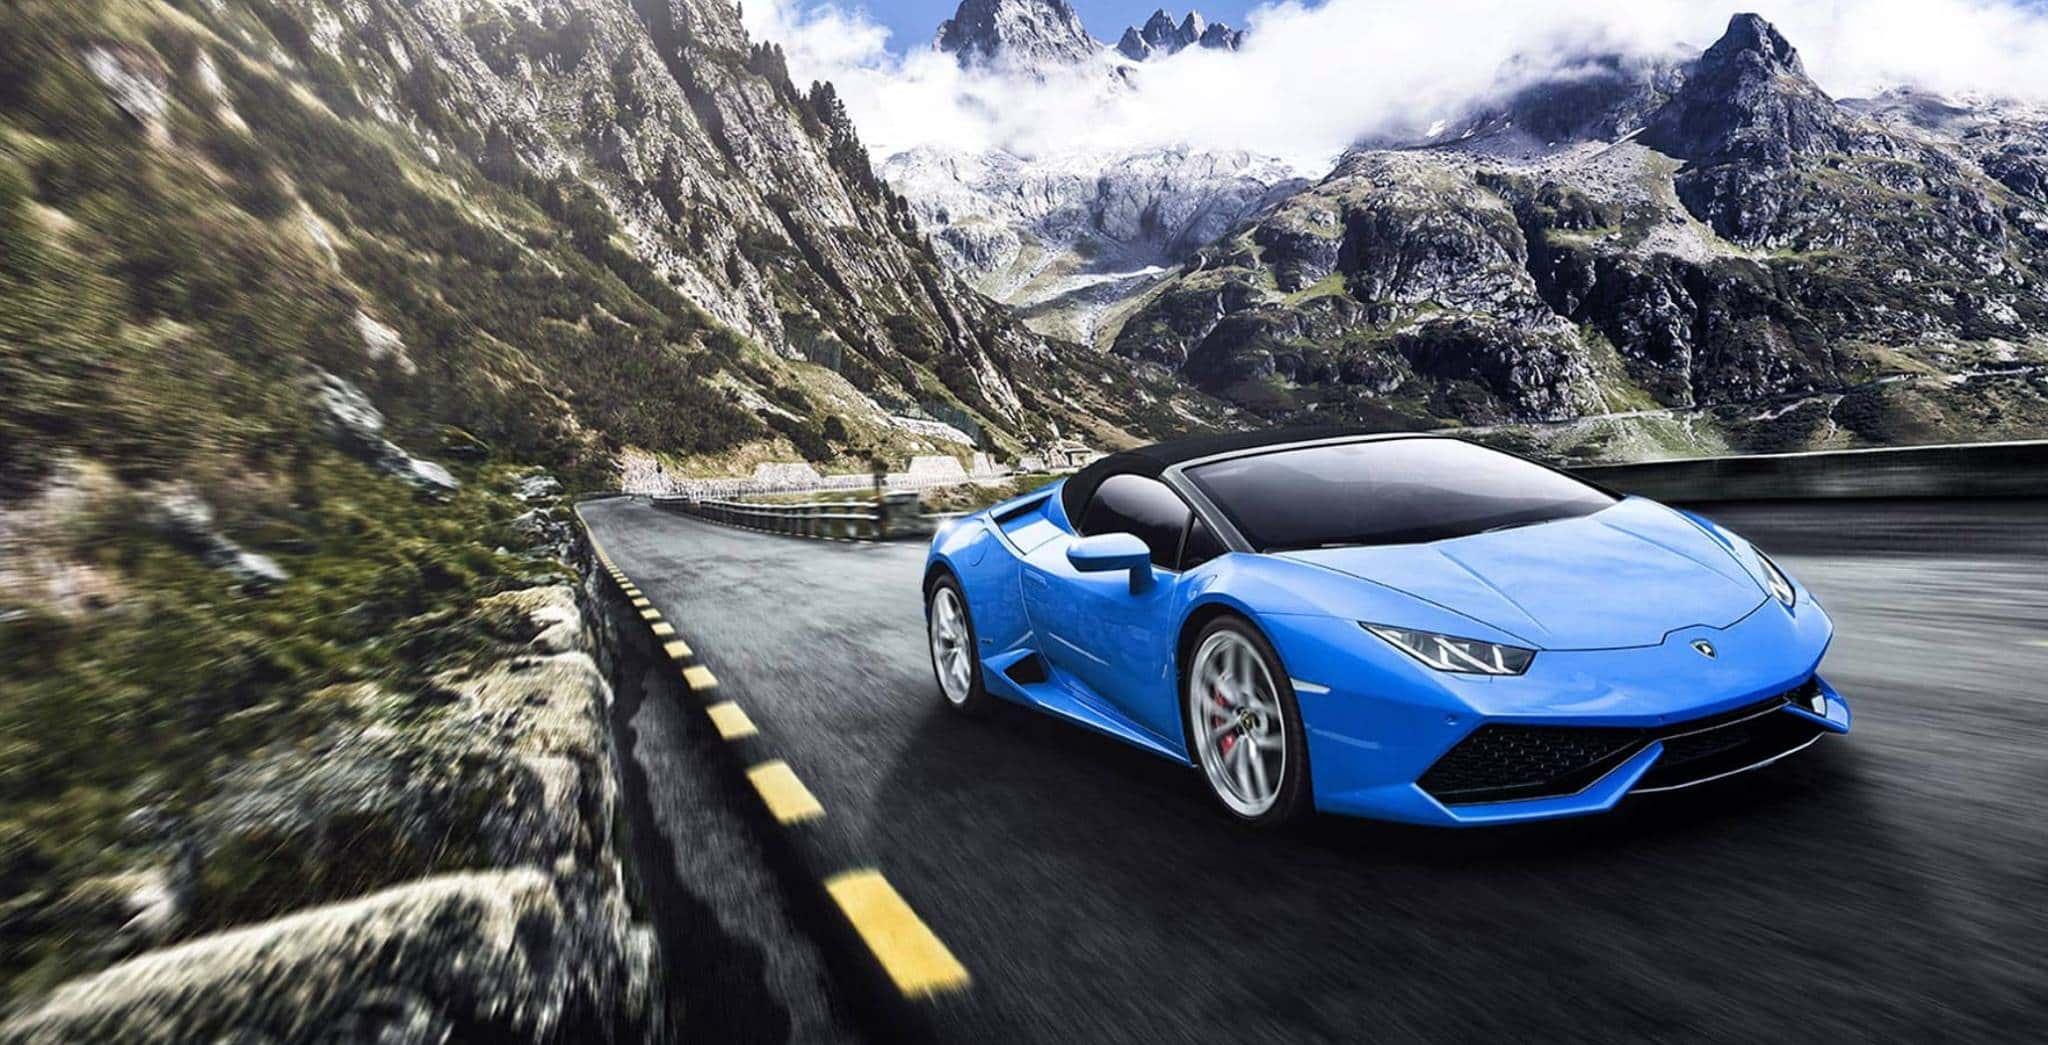 Lamborghini Huracan Spyder 2020 recibirá un rediseño